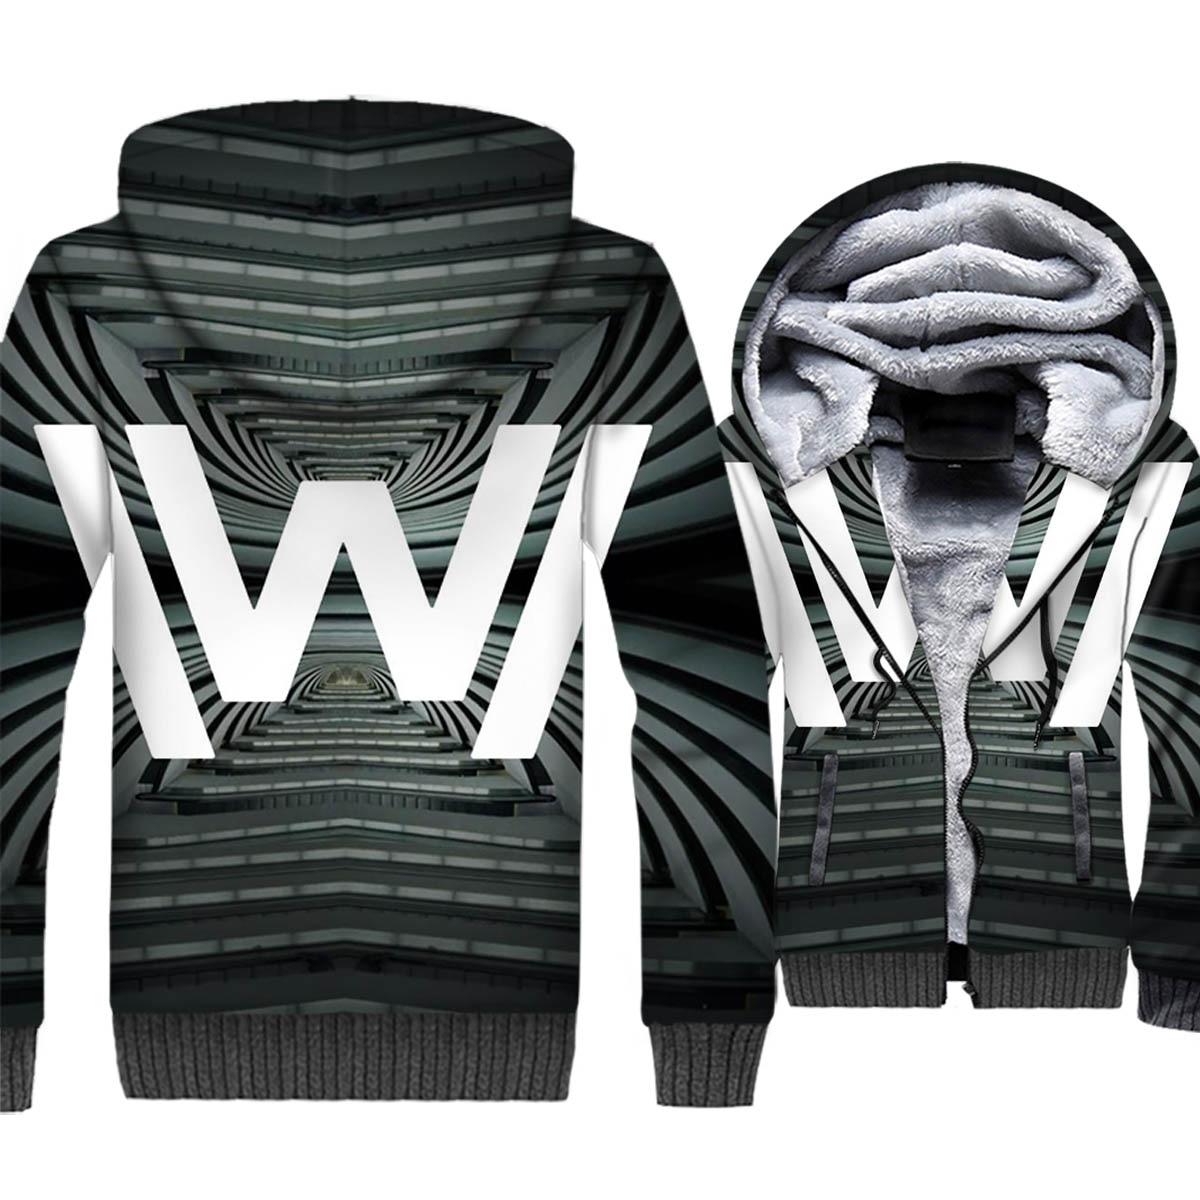 winter casual wool liner zipper hoodies 2019 new hot TV series Westworld jackets coats sportswear harajuku plus tracksuits M 5XL